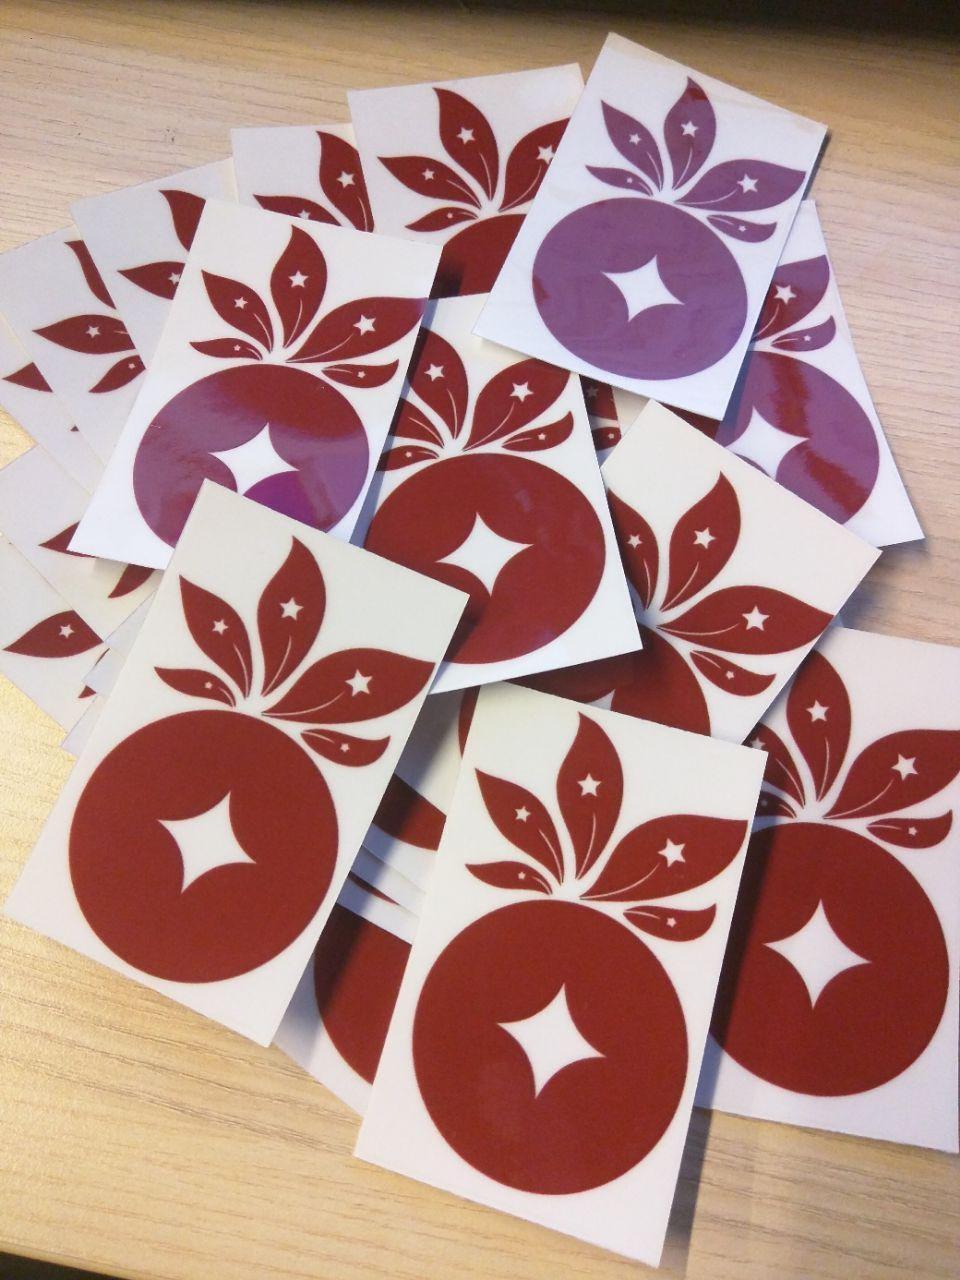 SITCON x HK Stickers